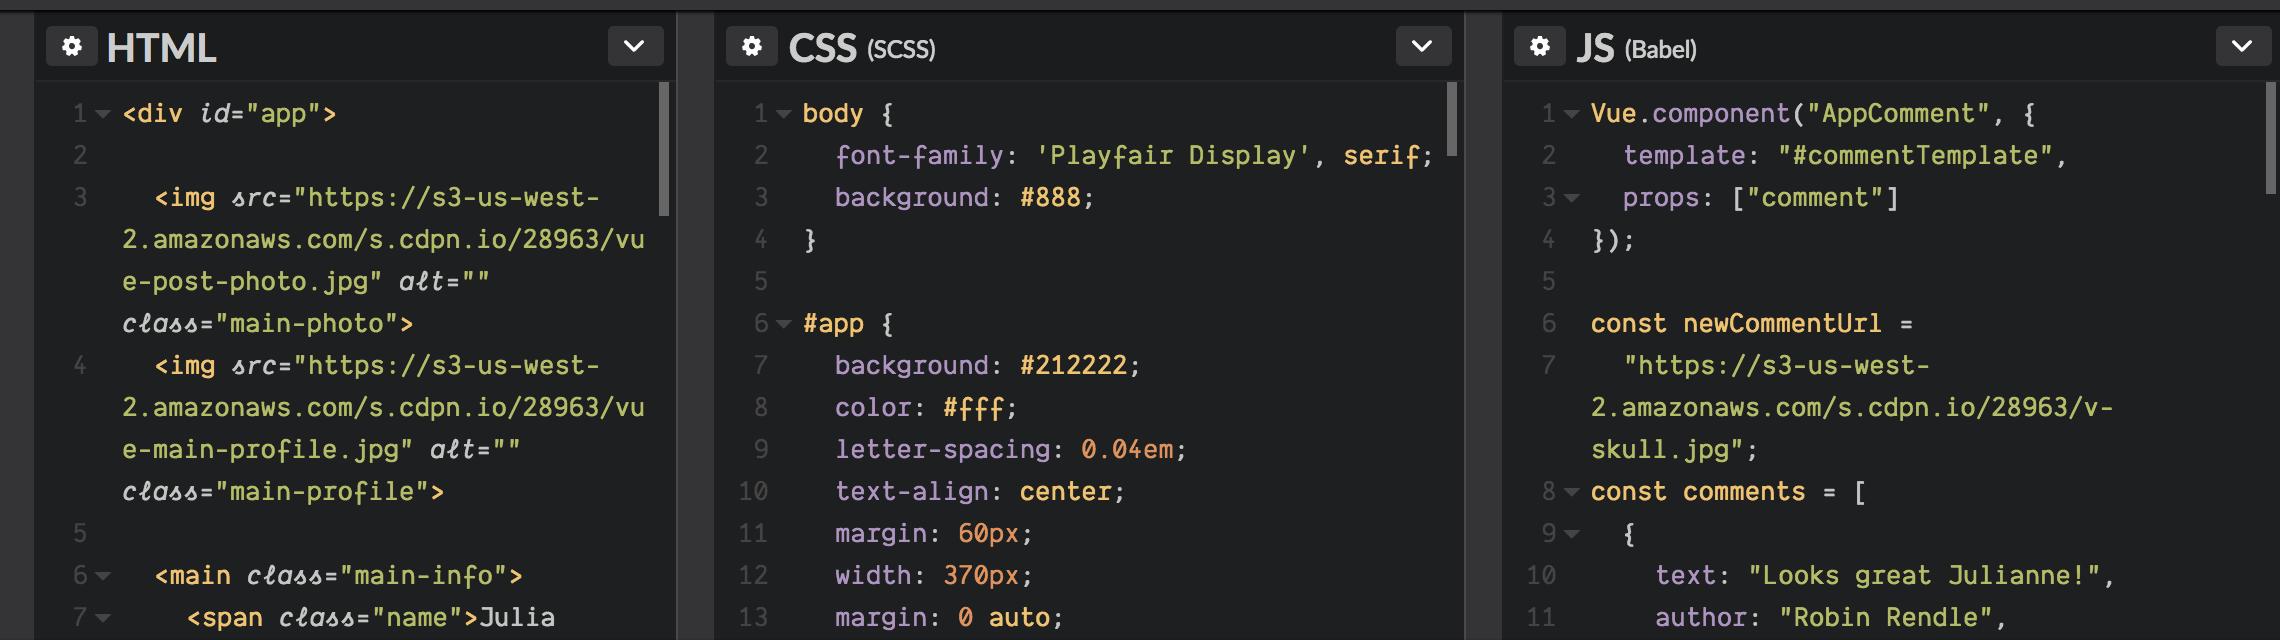 - dank mono - New Coding Fonts: Dank Mono and Gintronic